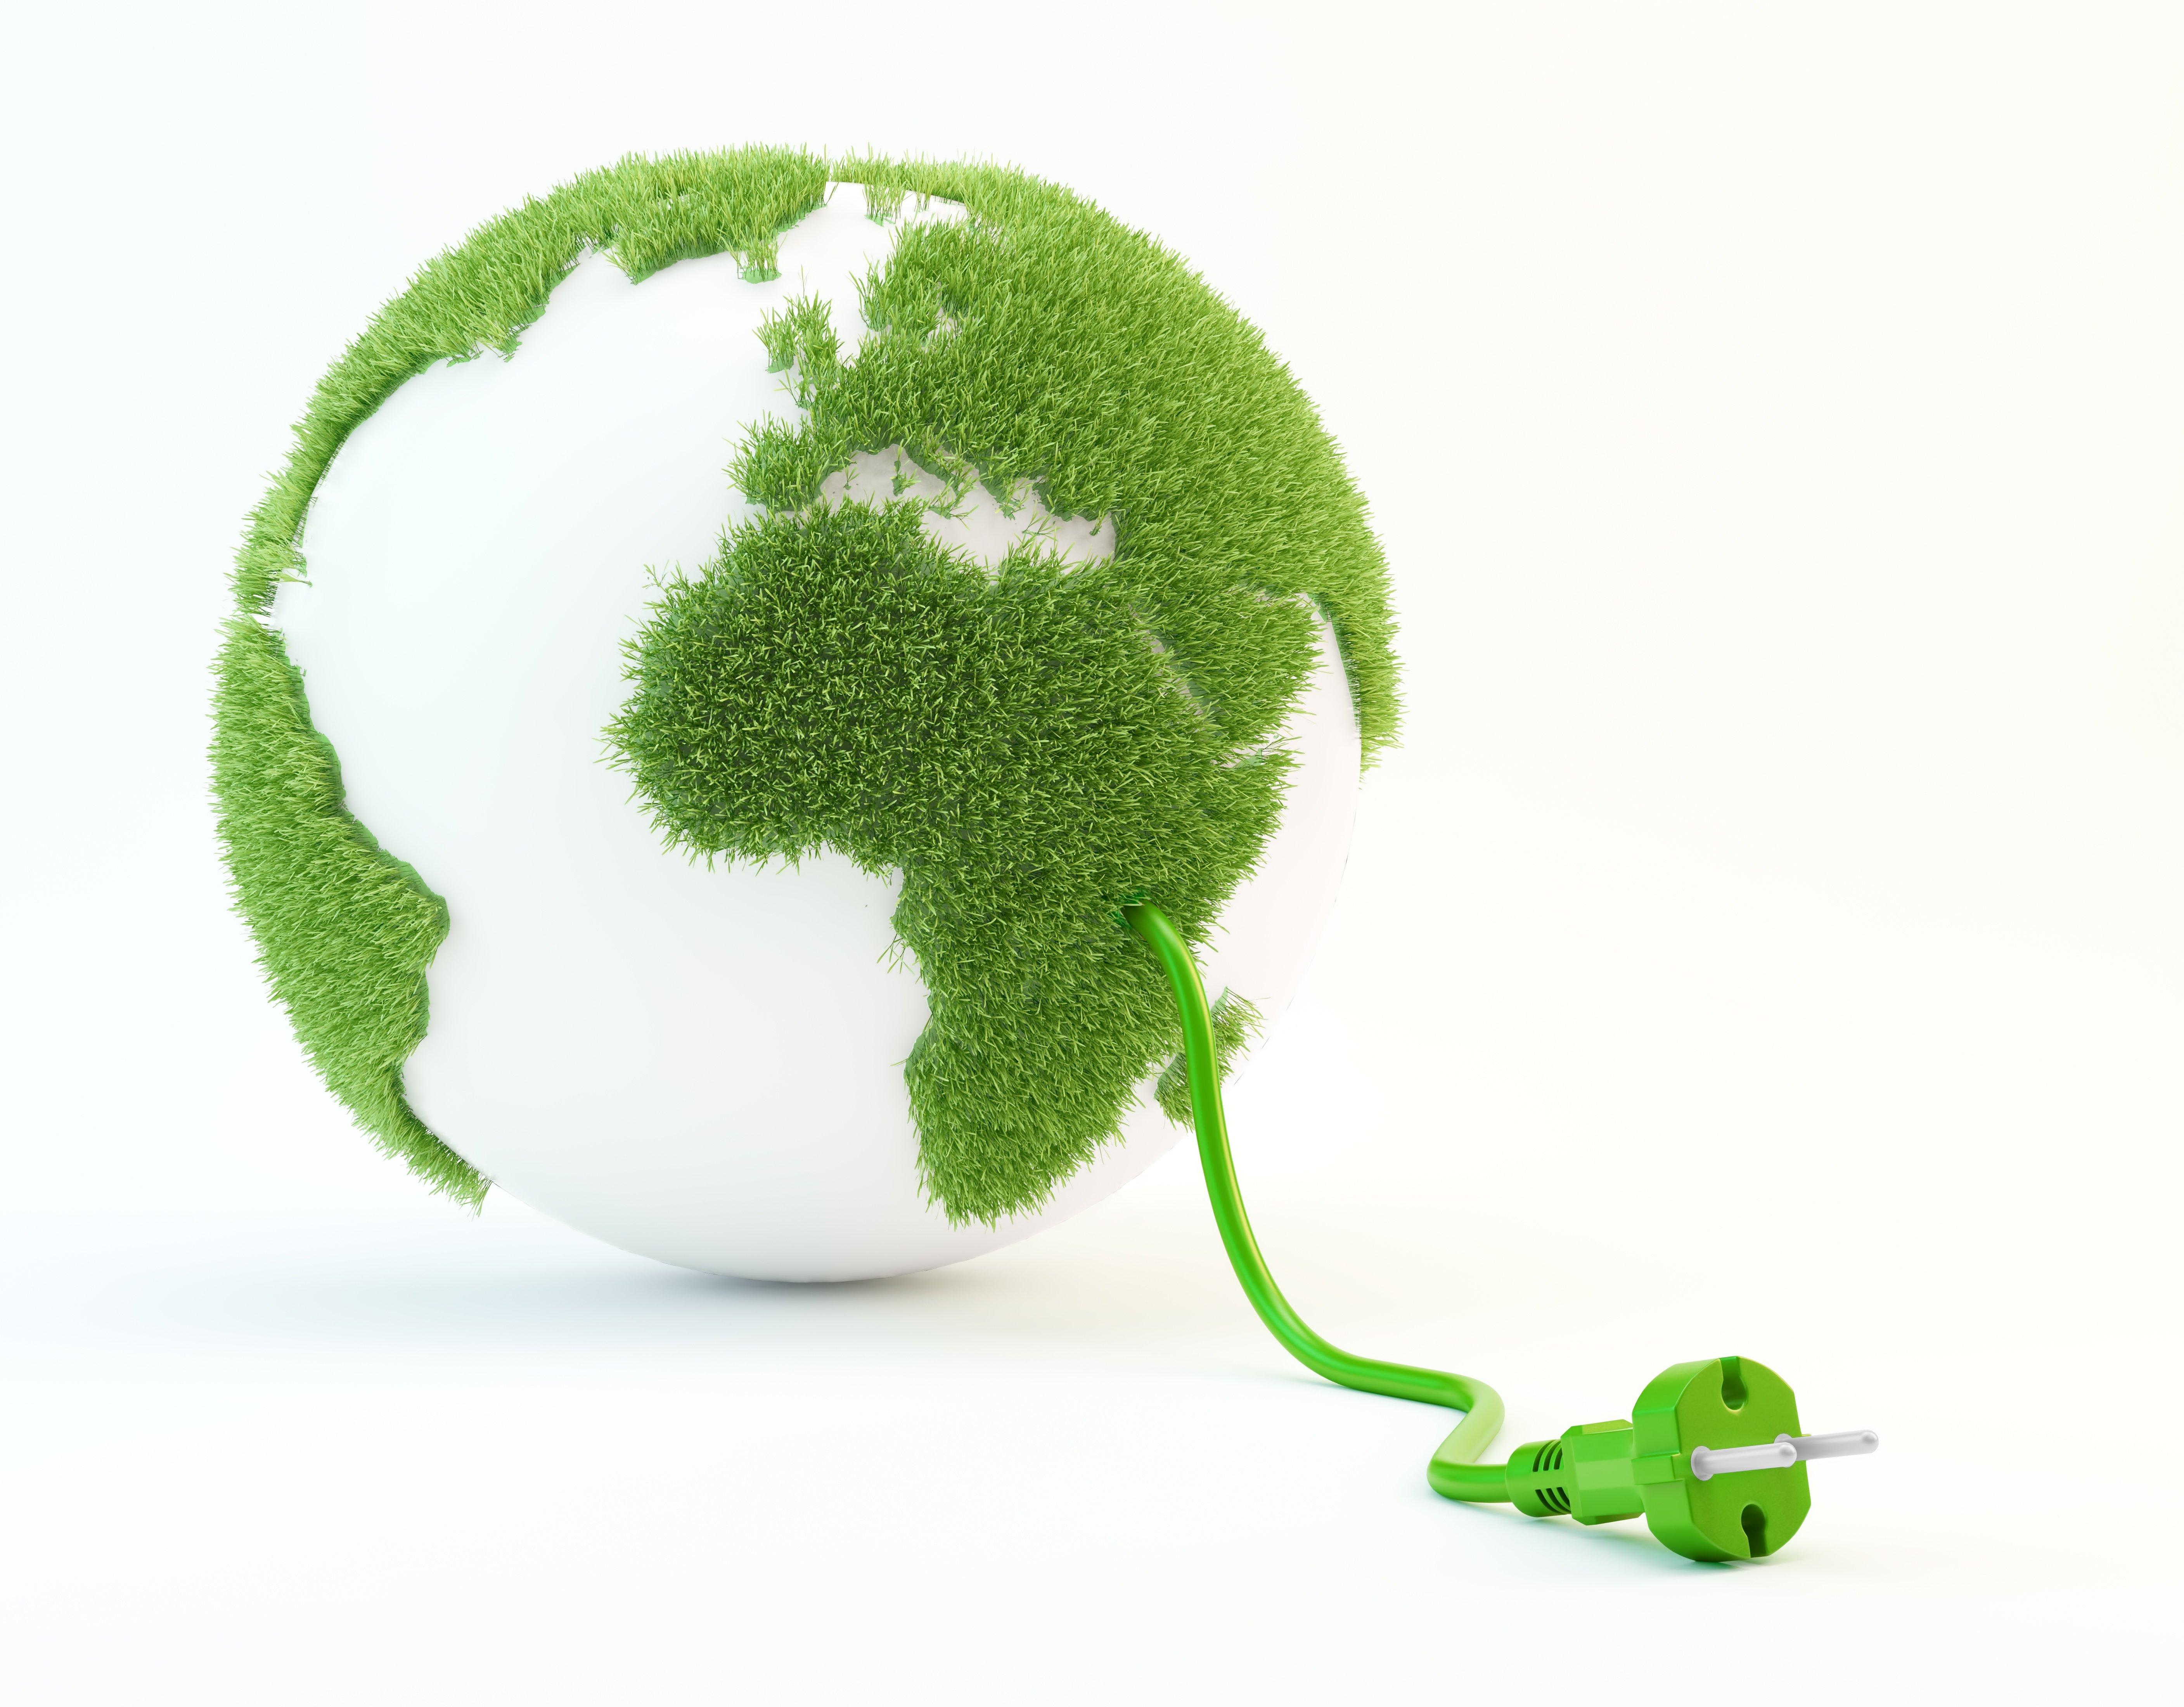 clean energy globe concept